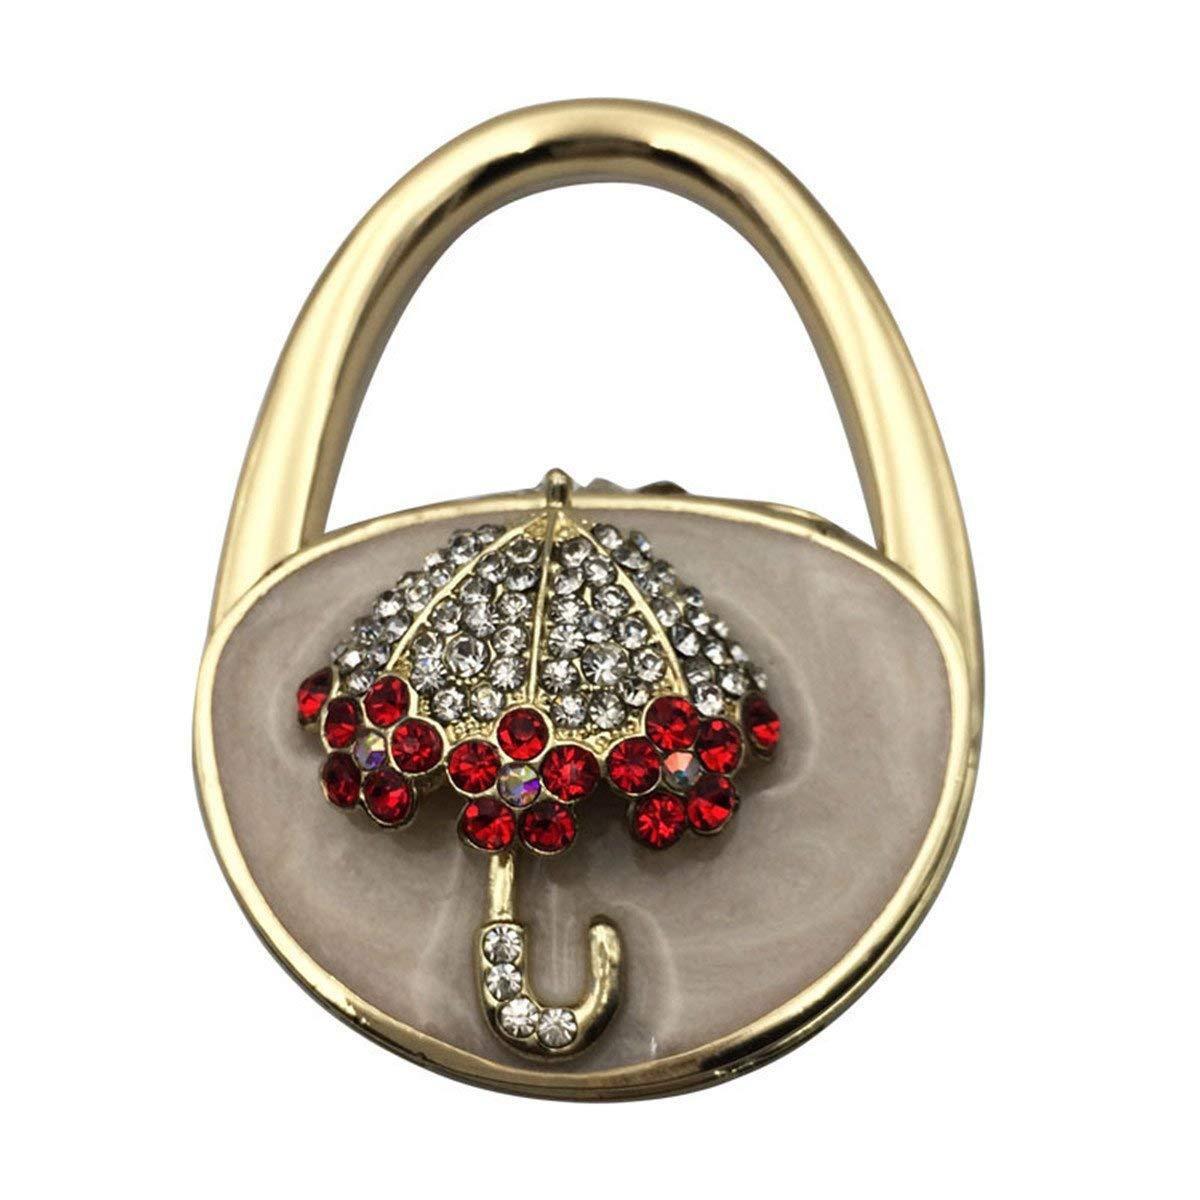 Purse Hook Desk Folding Handbag Holder Caballos Travel Purse Holder for Table